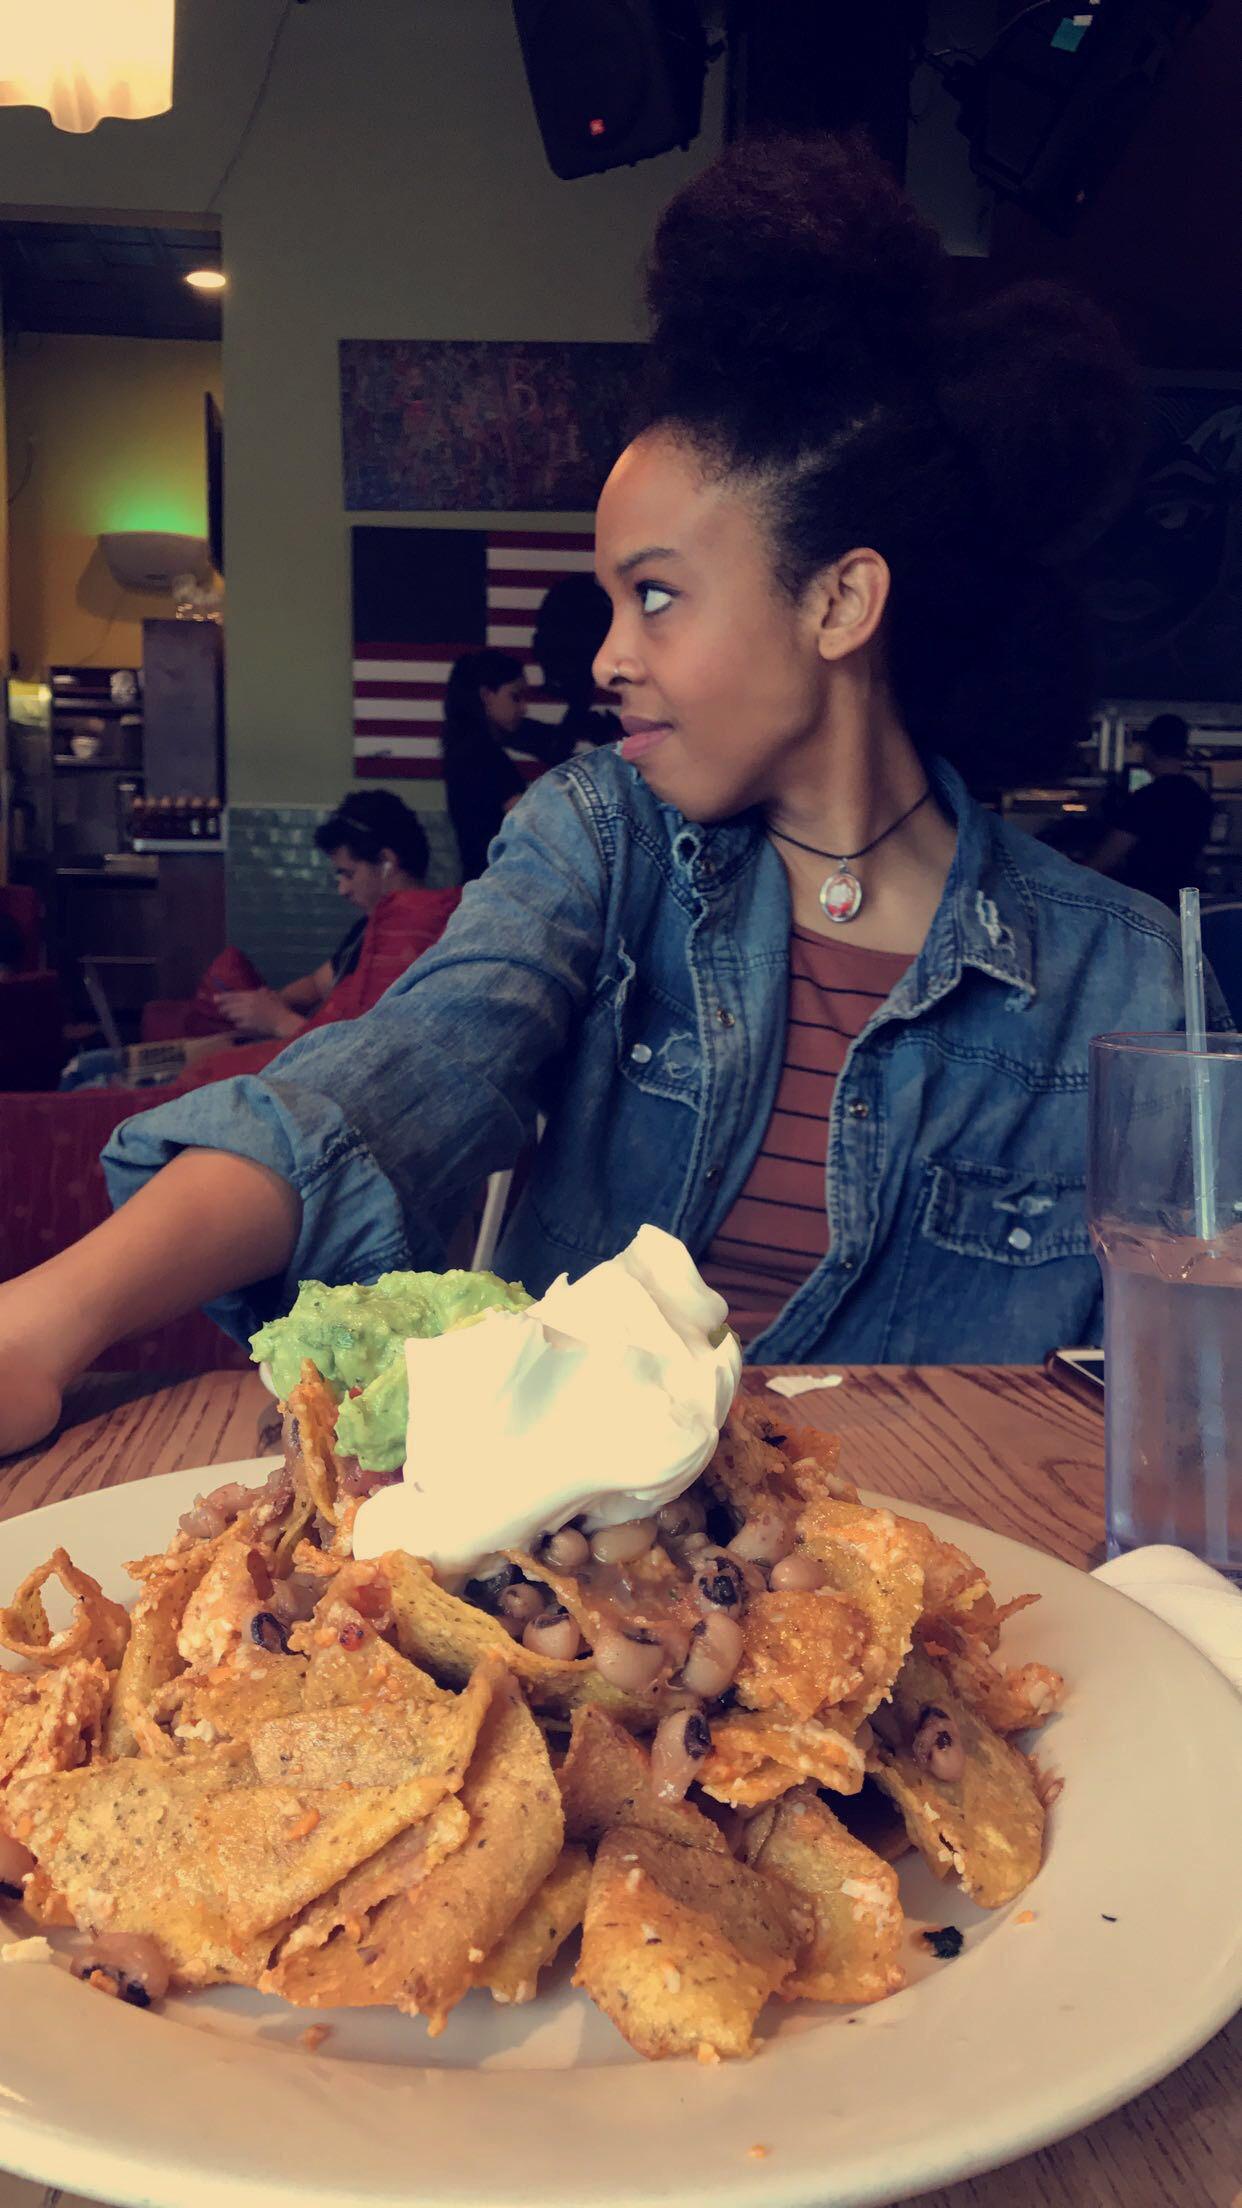 * vegan nachos at Busboys and Poets restaurant in Washington, D.C.